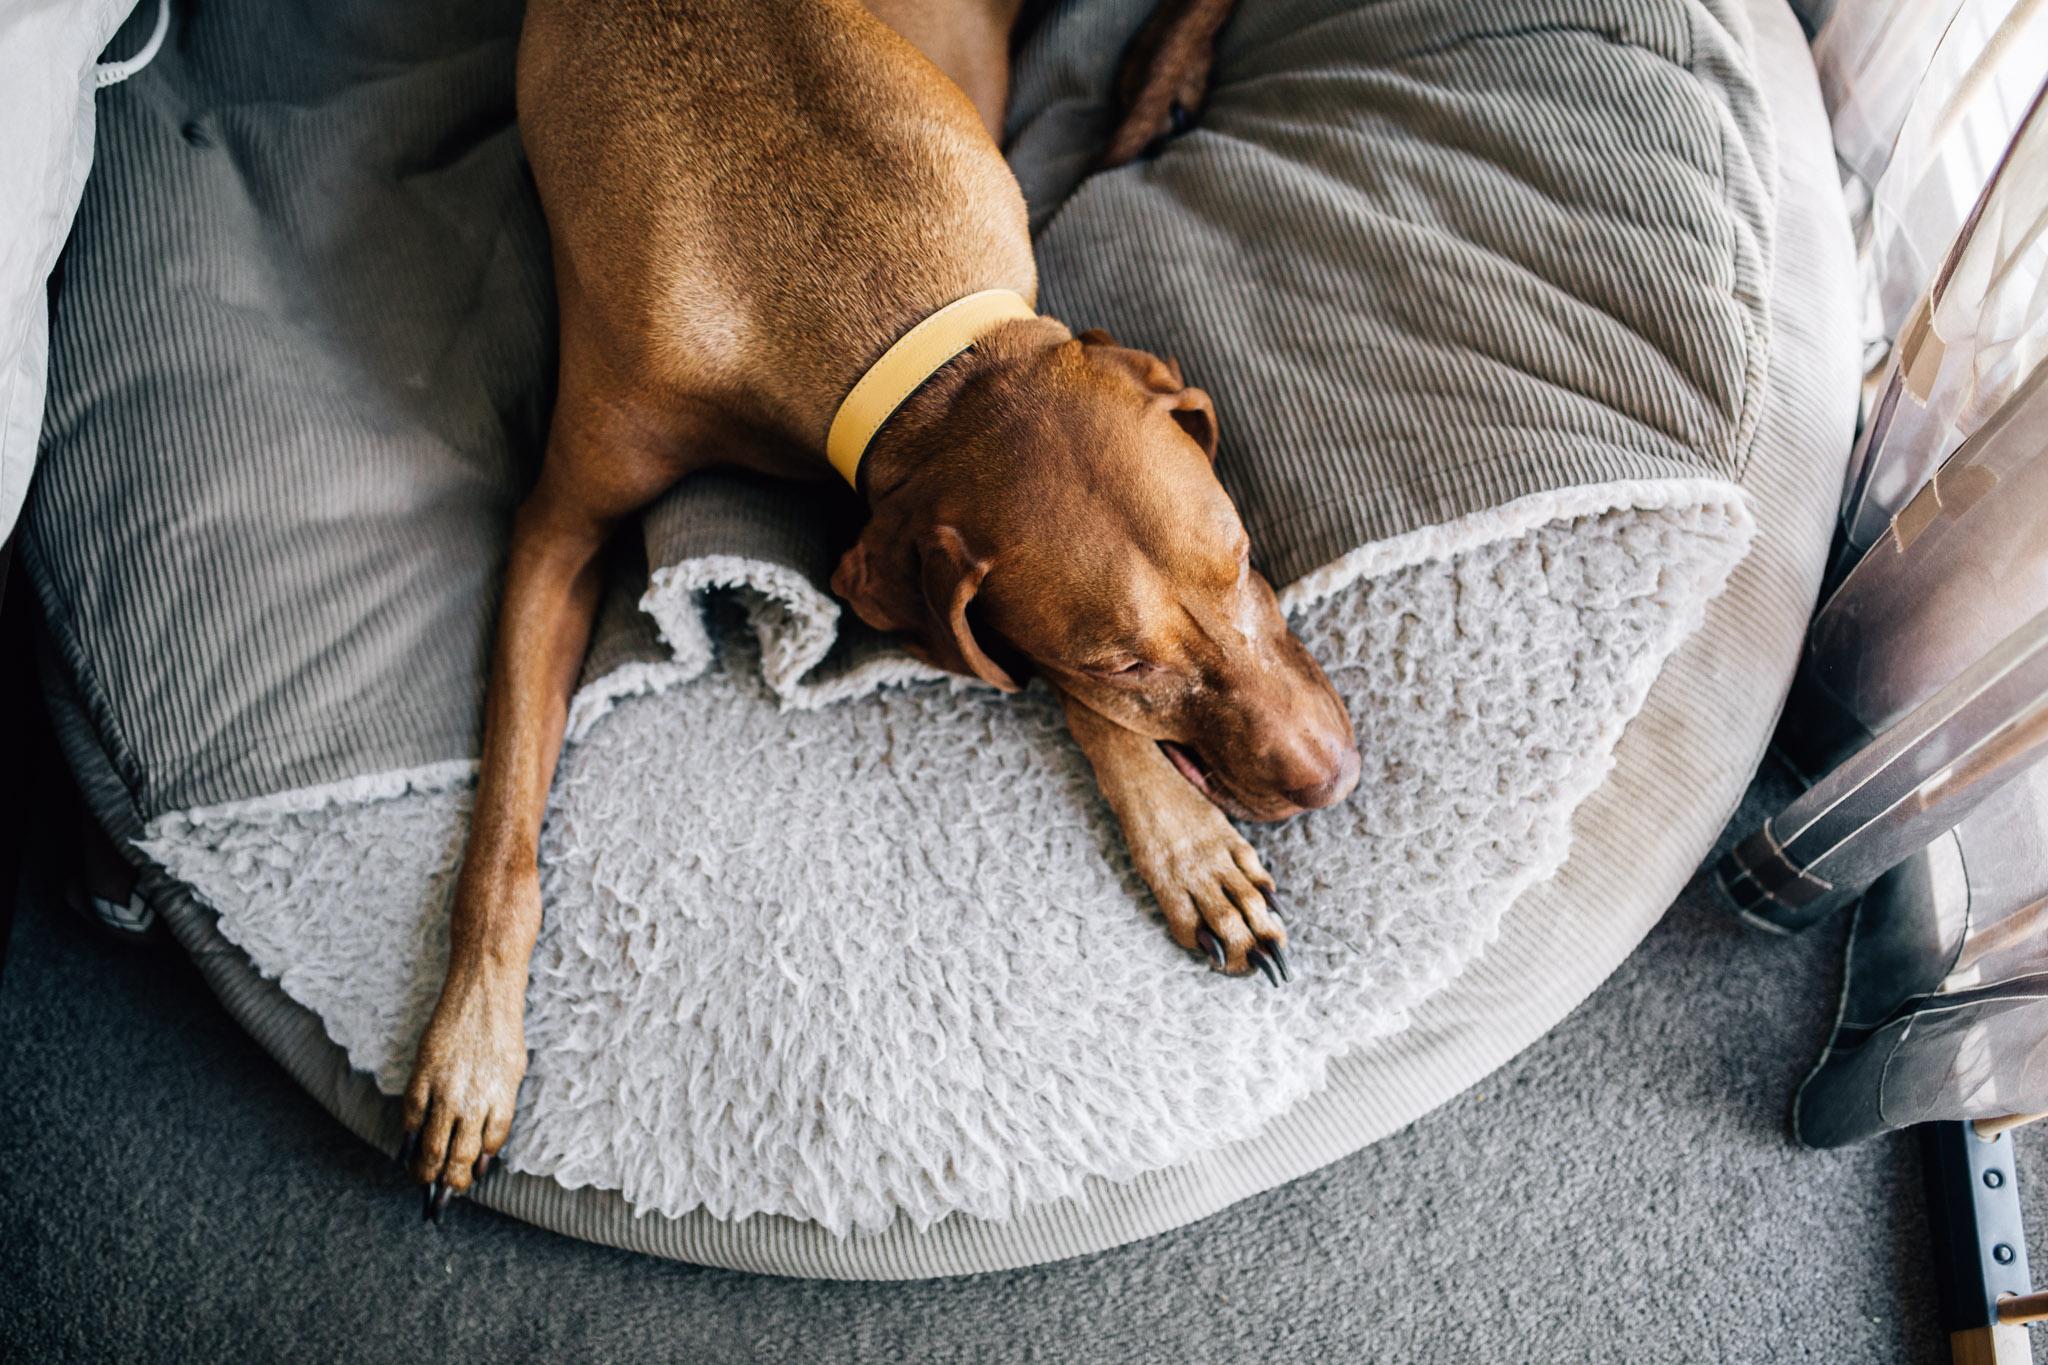 dog-sleeping-on-day-bed (1 of 1).jpg